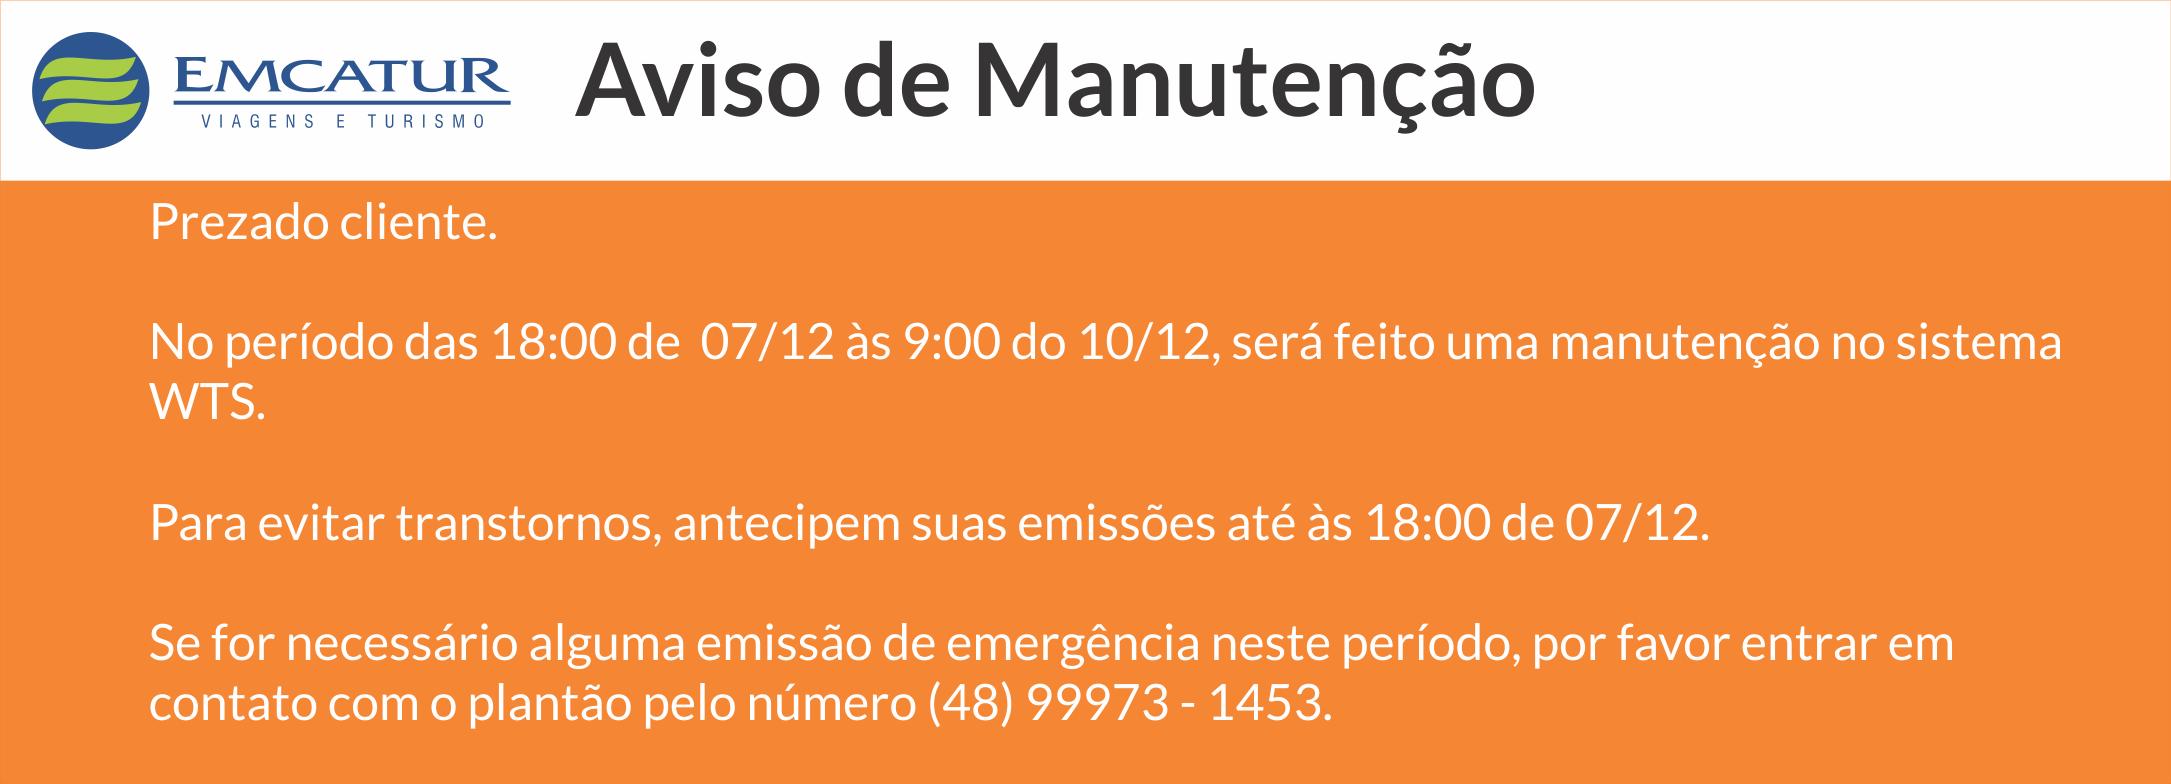 009a96df-e0c4-4bbe-b16c-b534e6c39c1f.png